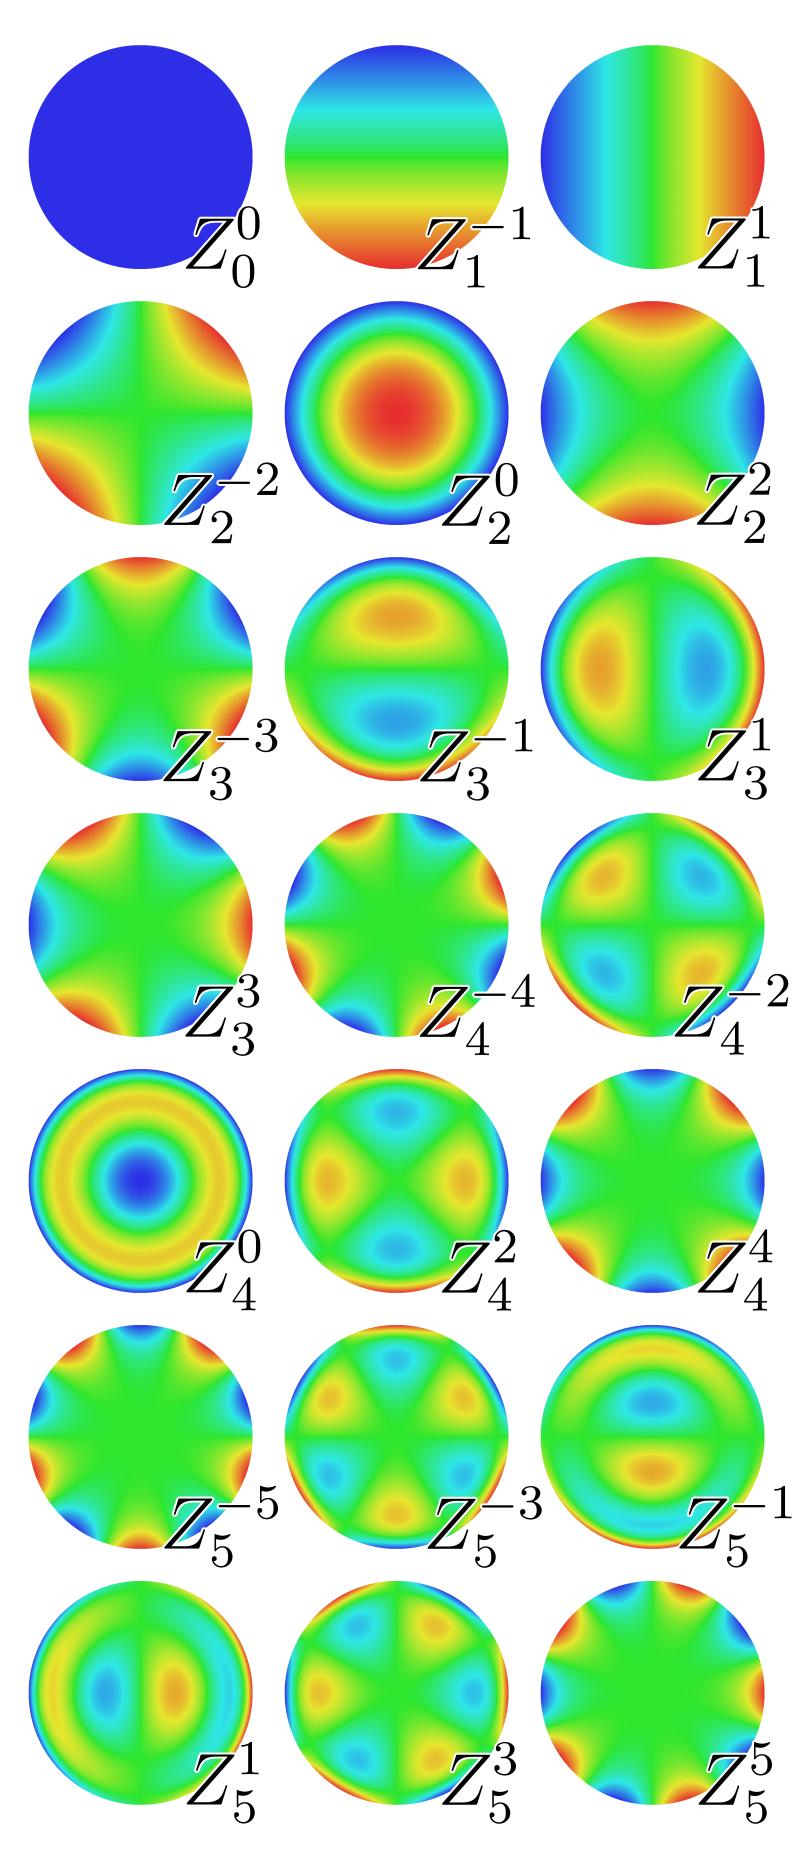 File:Zernike polynomials.png - Wikimedia Commons